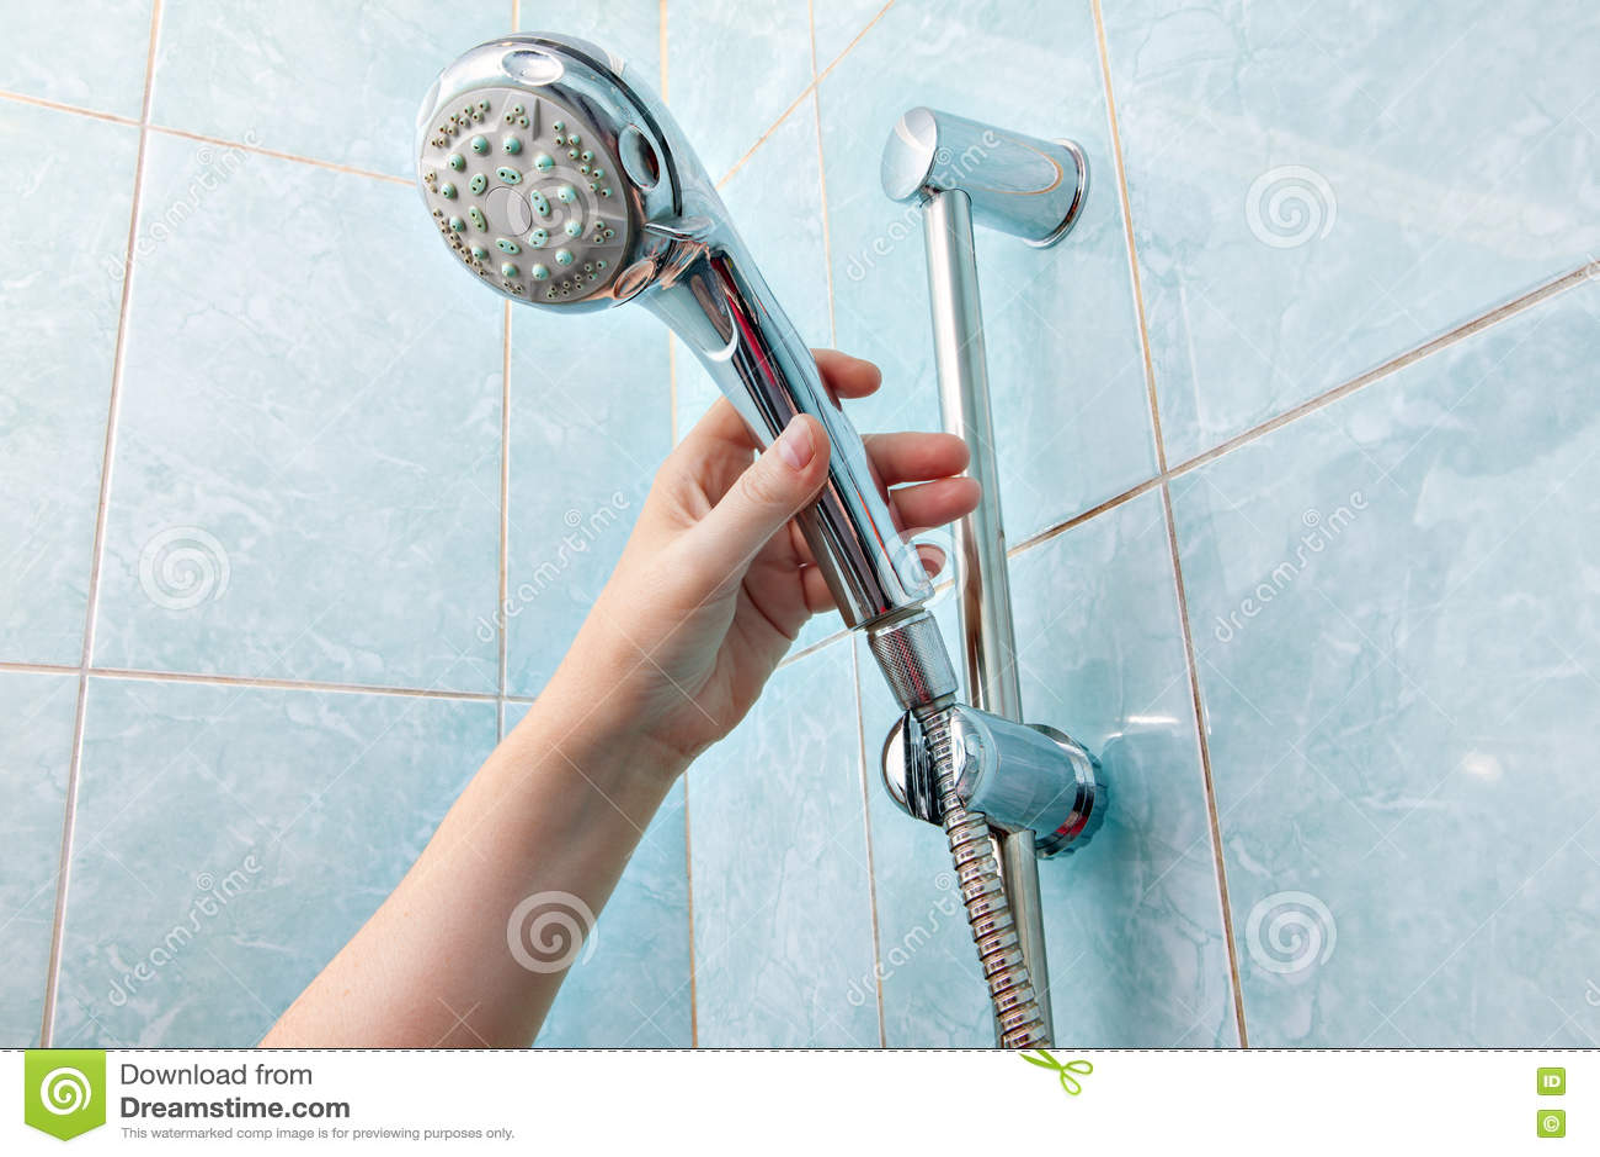 Close Up Of Human Hand Adjusts Holder Shower Head With Hose